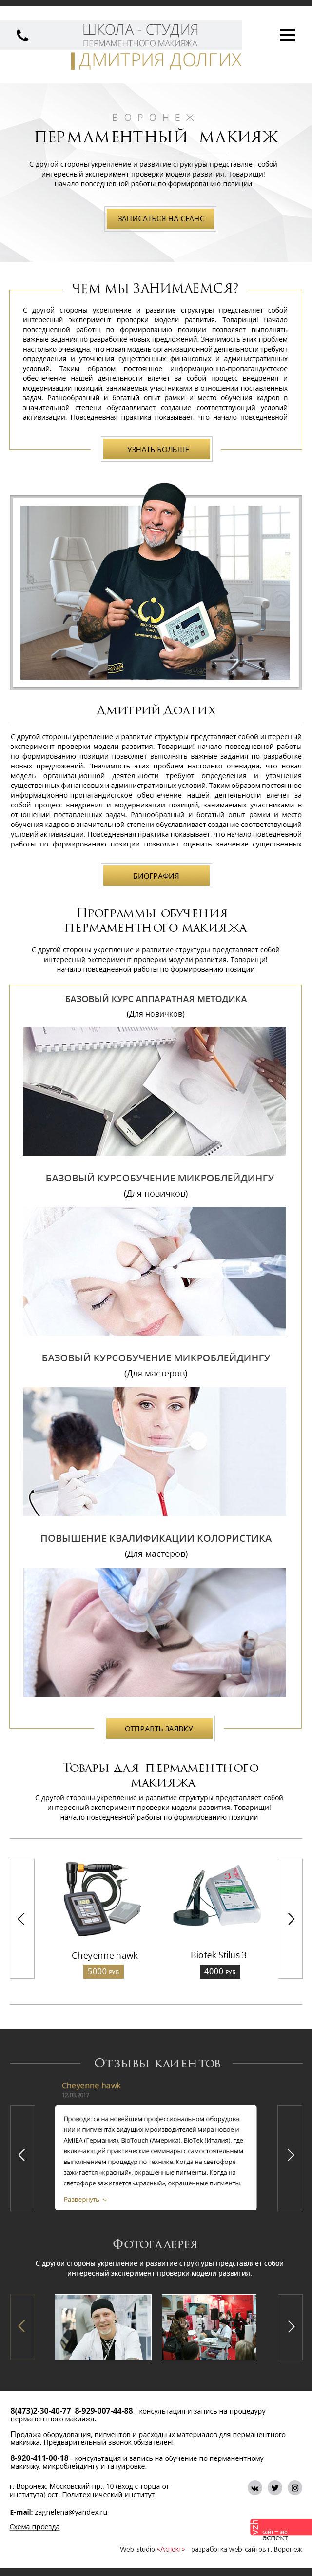 Школа-студия перманентного макияжа 640 px